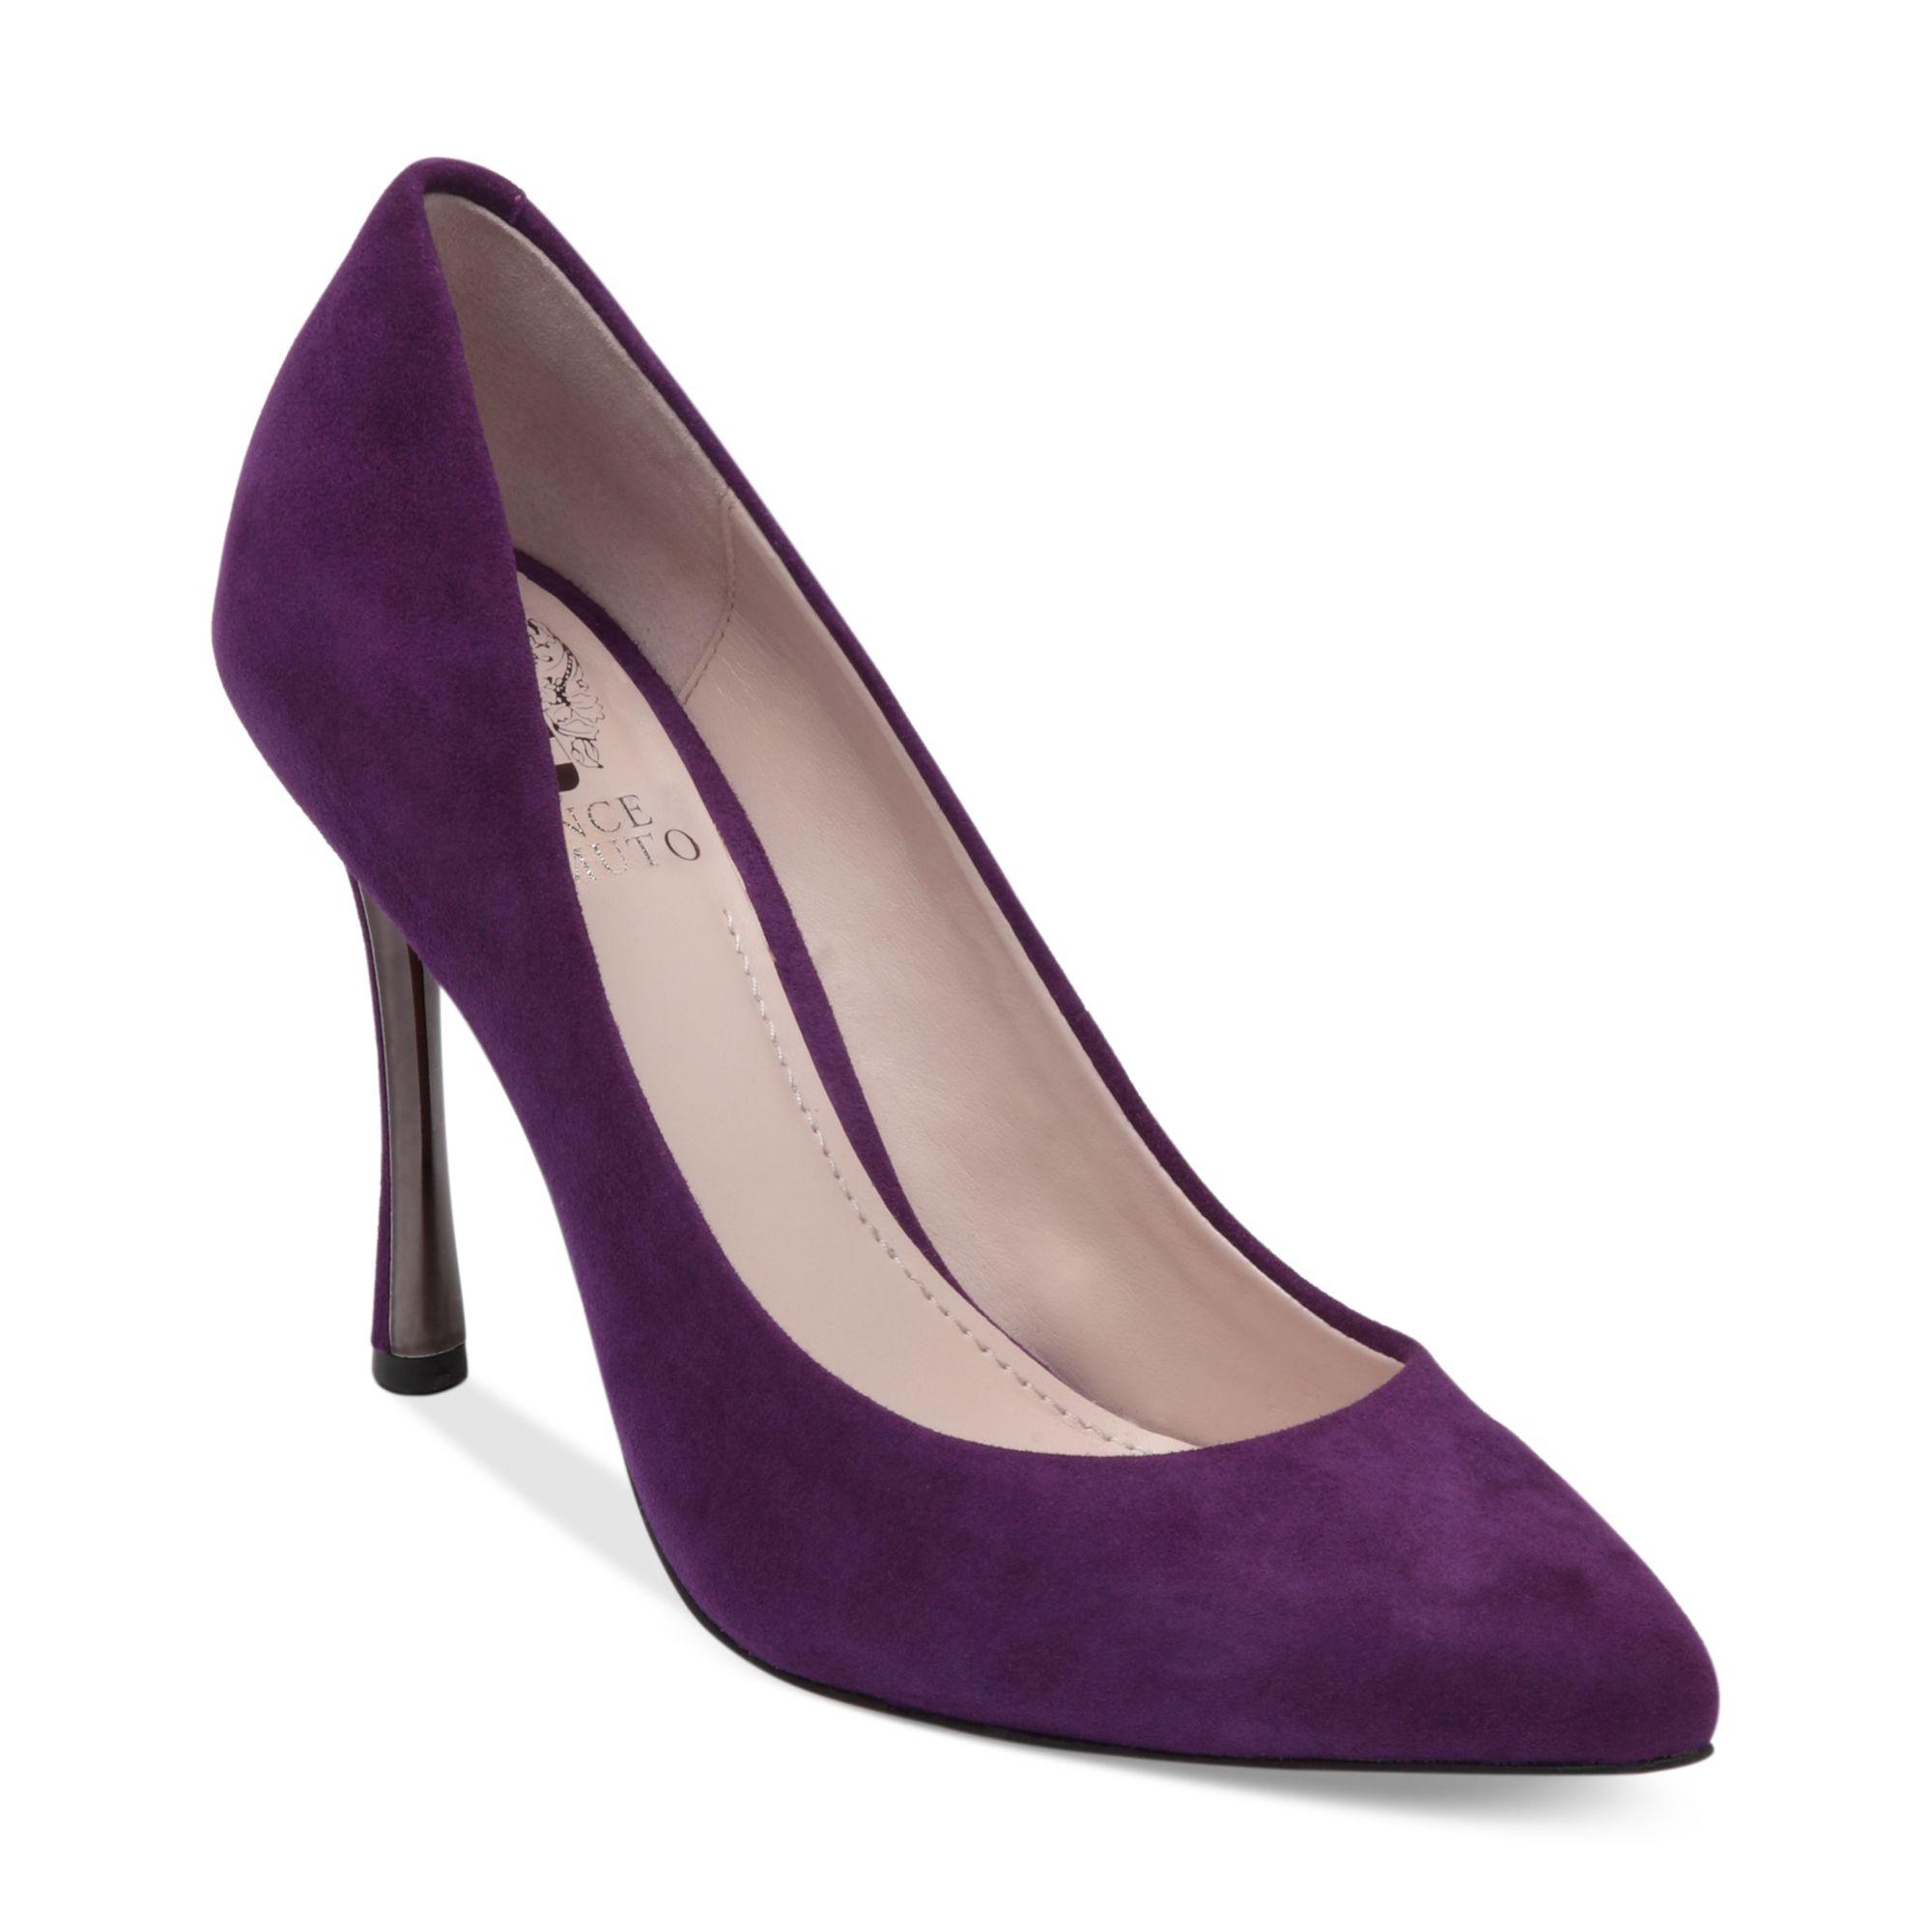 Vince Camuto Cynthea Pumps In Dark Purple Purple Lyst